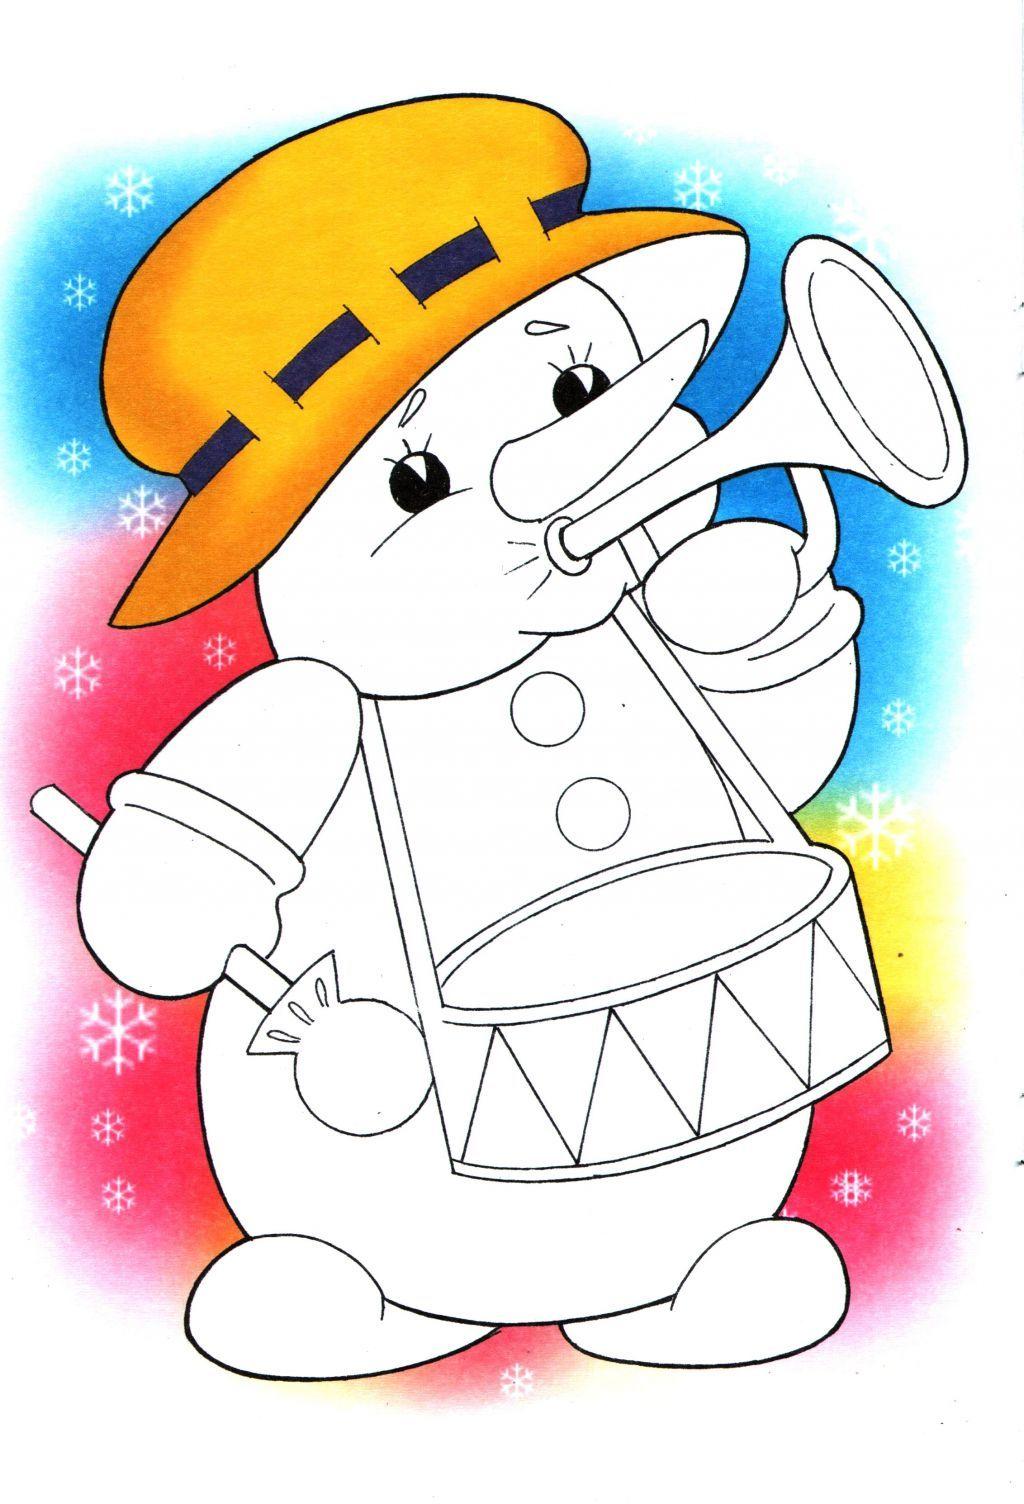 Muzikale Sneeuwpop Felt Quiet Books Activities For Kids Games For Kids